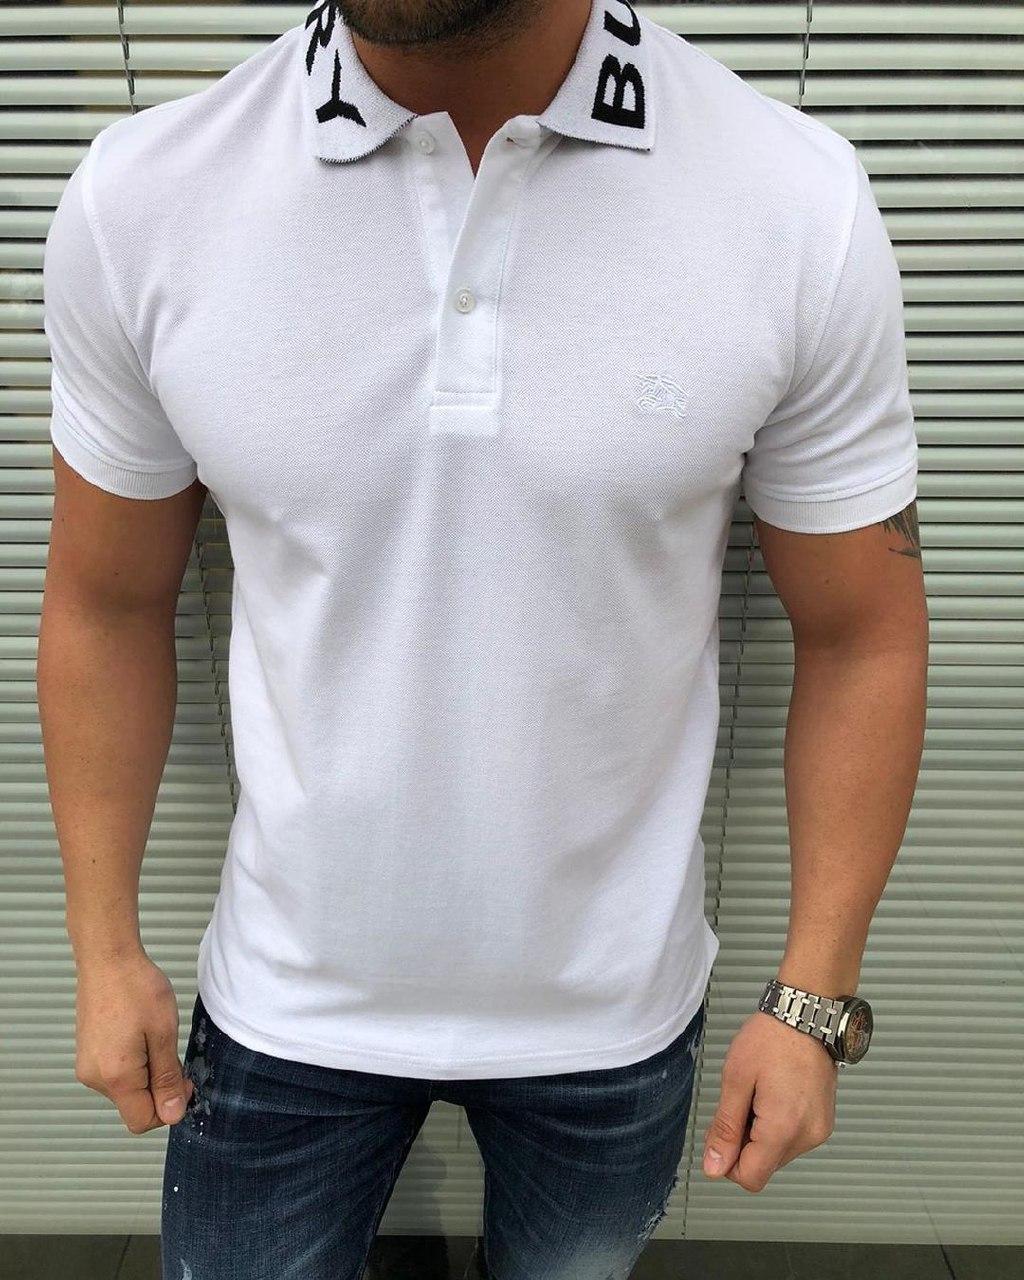 Мужская футболка поло Burberry M076 белая